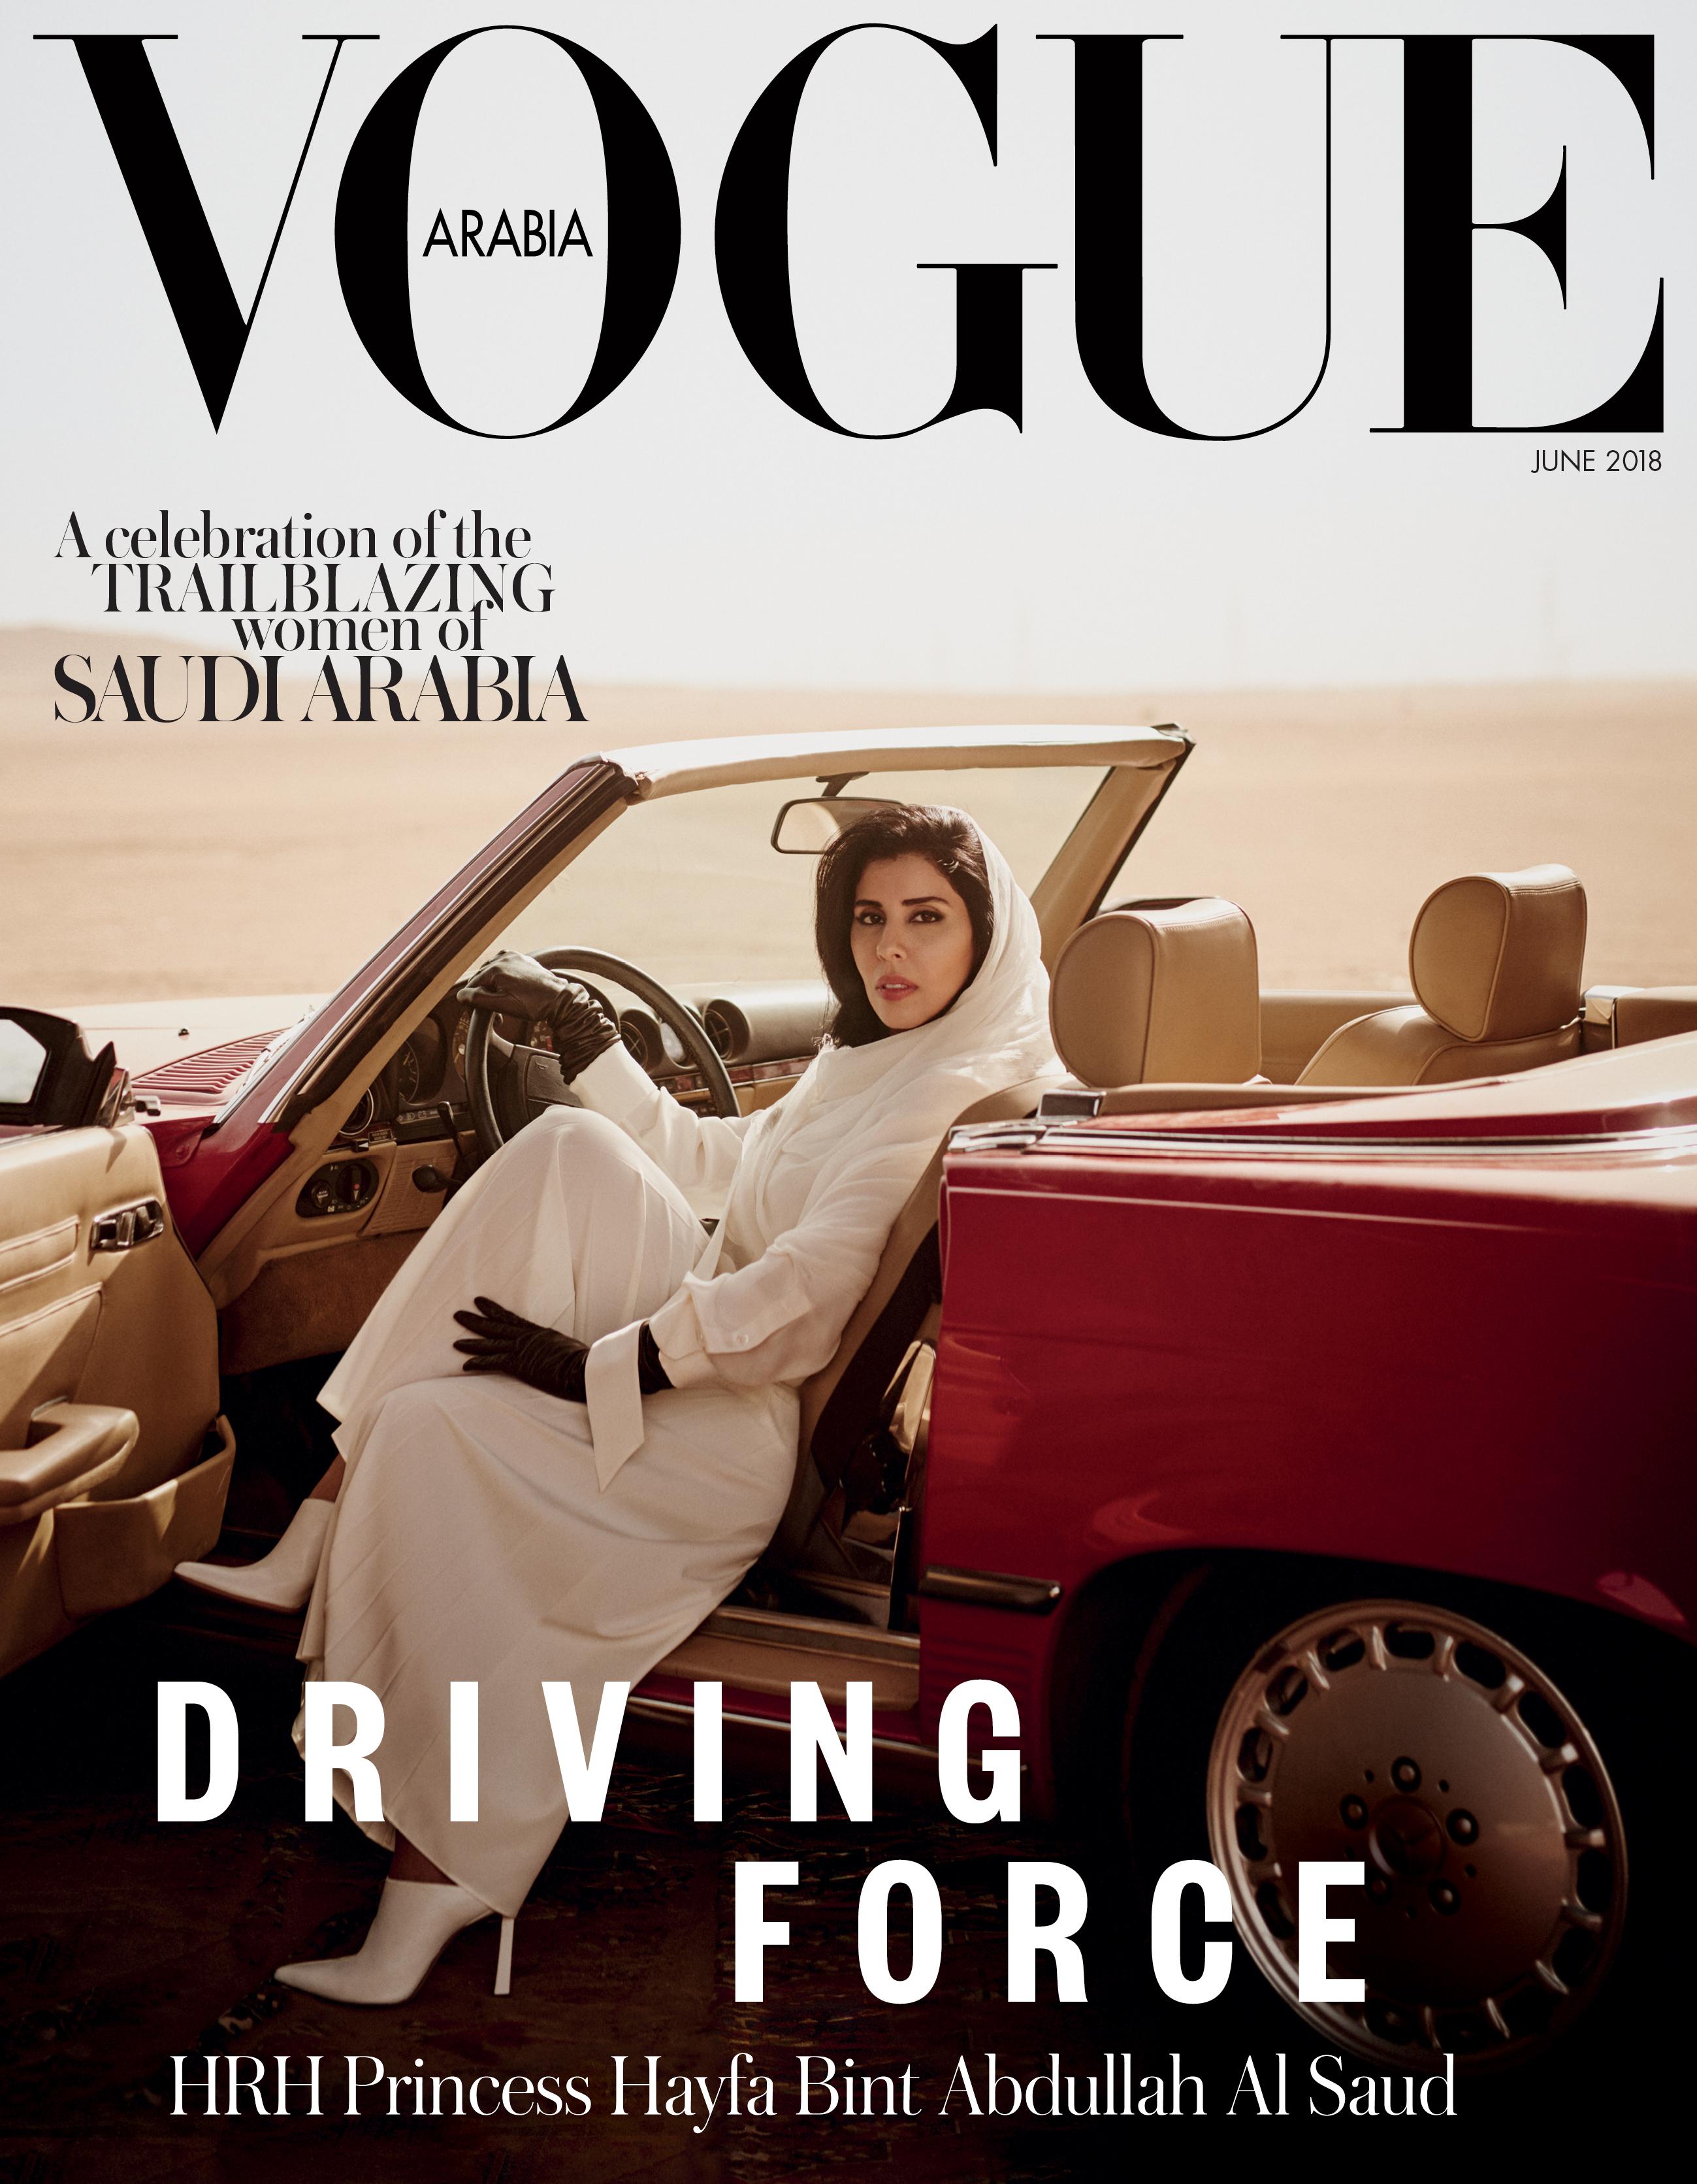 VOGUE ARABIA JUNE COVER